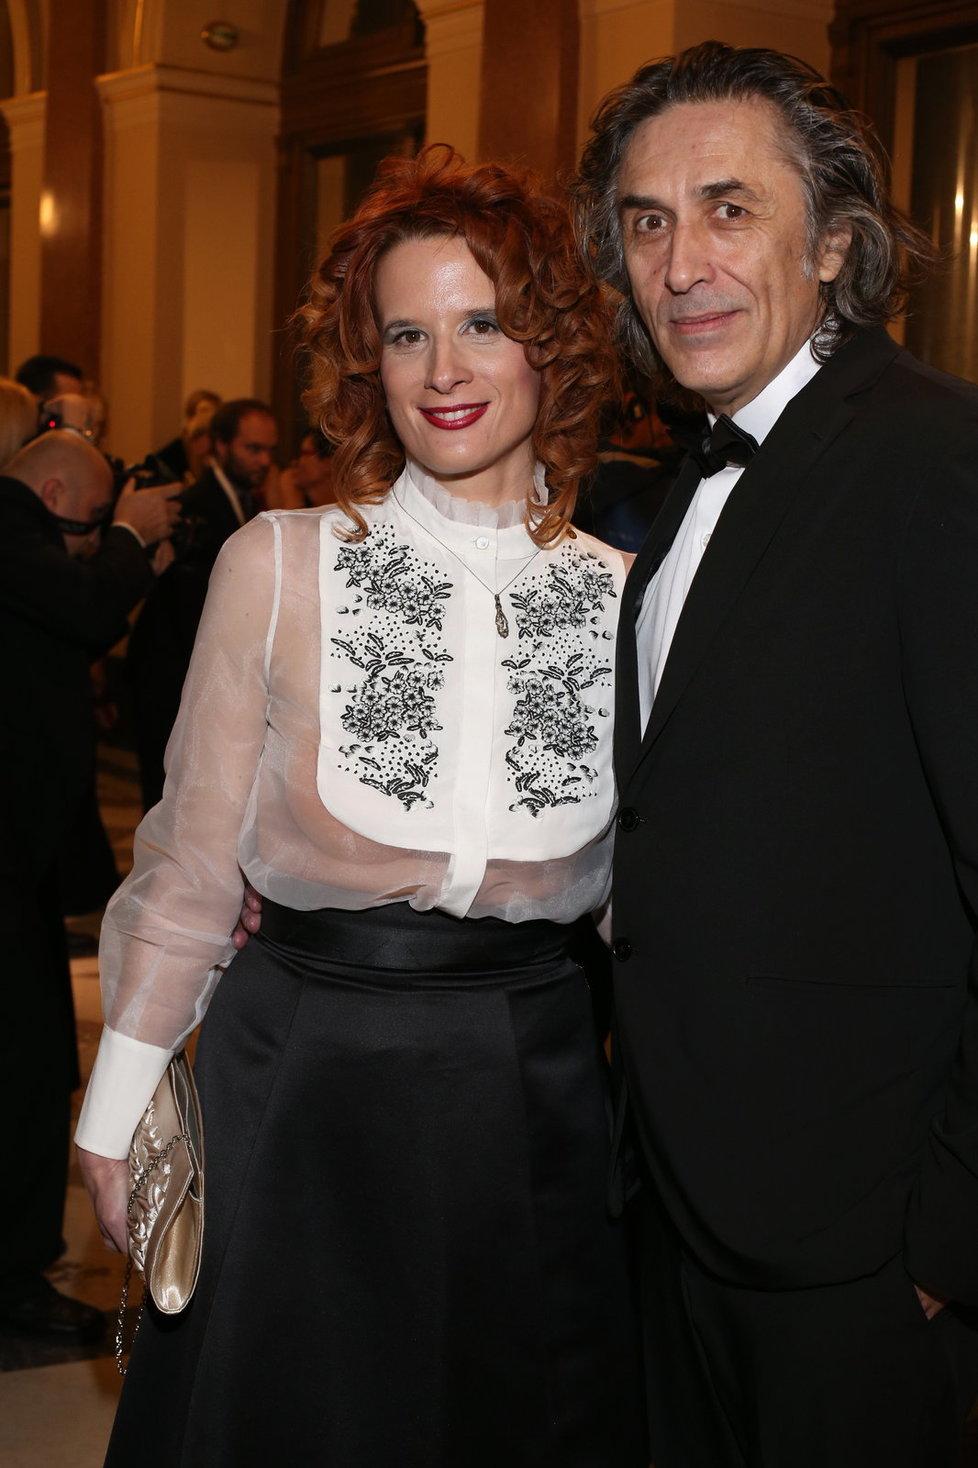 Srbský herec Predrag Bjelac s partnerkou